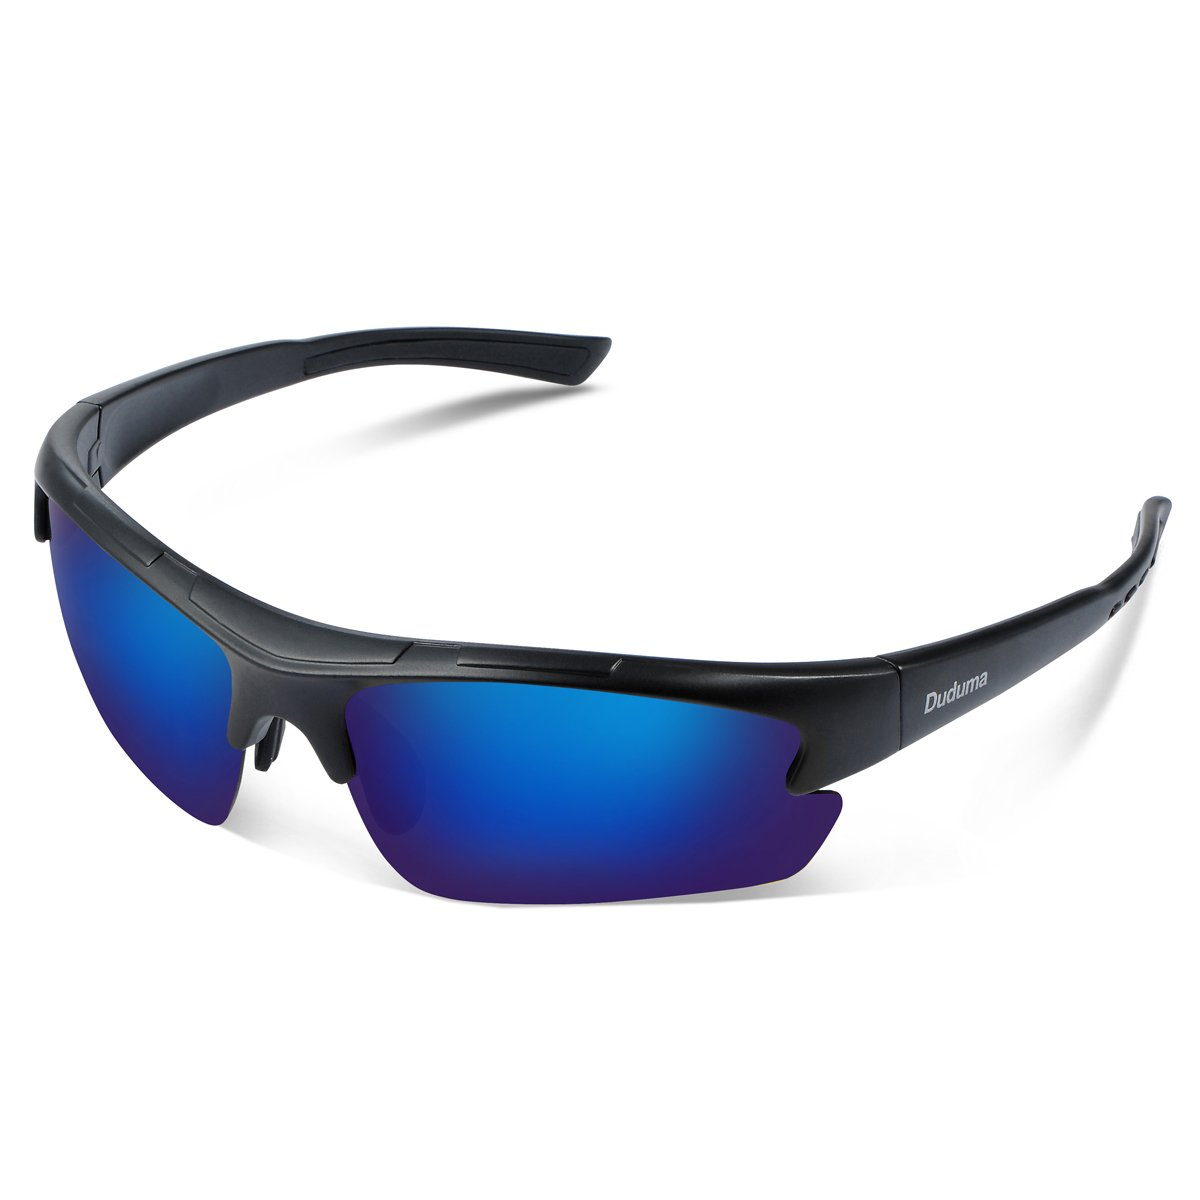 Duduma Polarized Designer Fashion Sports Sunglasses for Baseball Cycling Fishing Golf Tr62 Superlight Frame (Black Matte Frame with Blue Lens) by Duduma